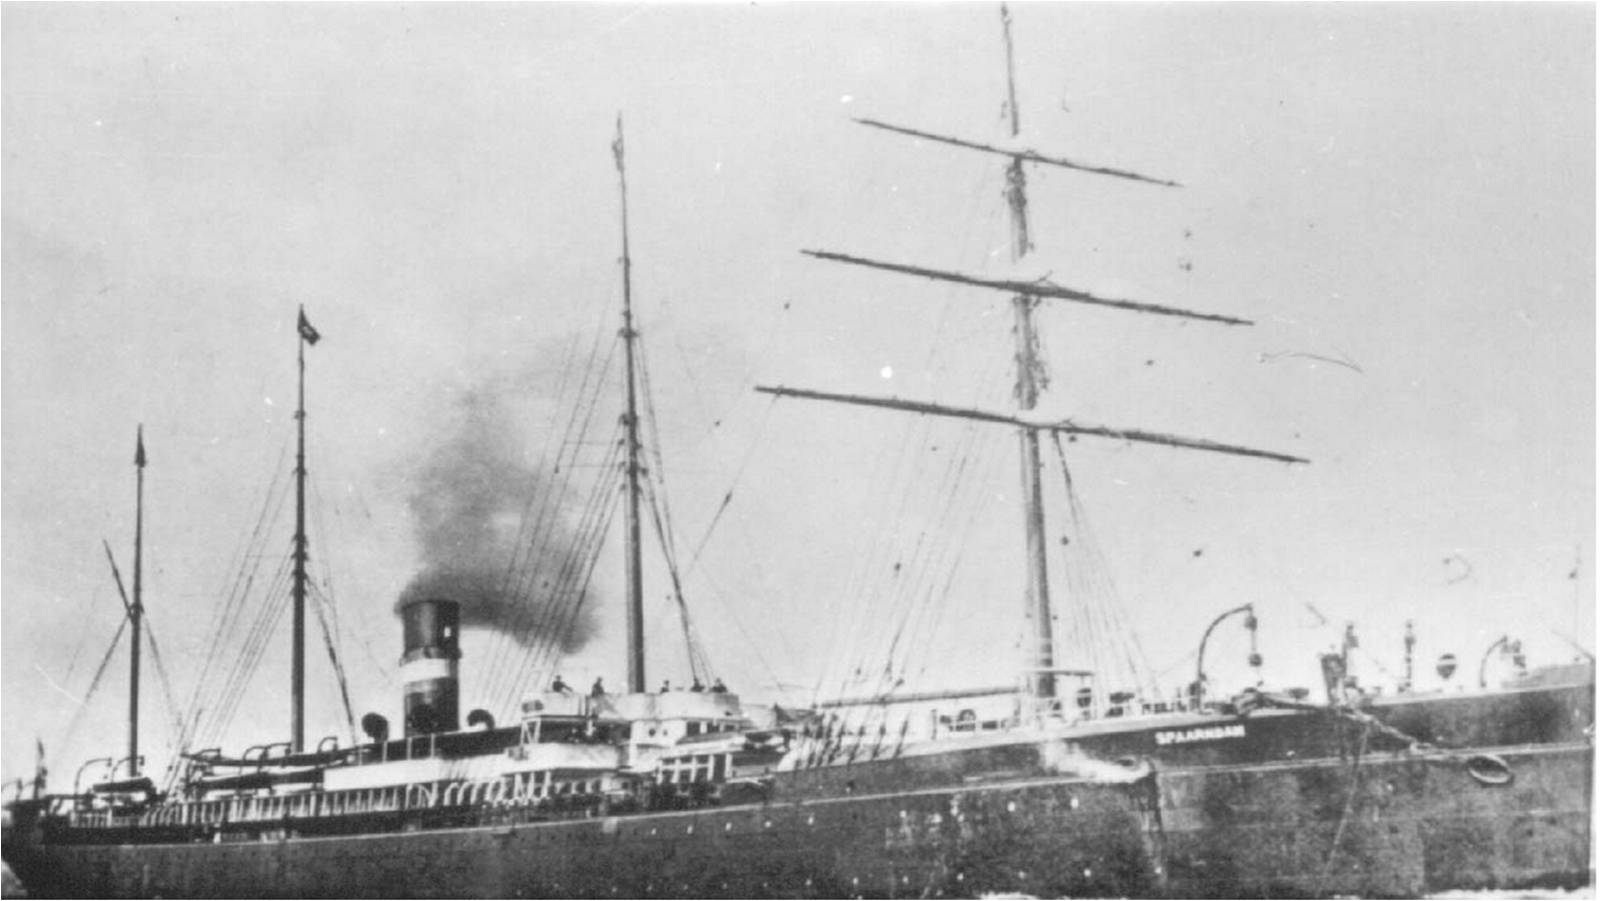 Ship Manifest (Spaarndam, 1895)